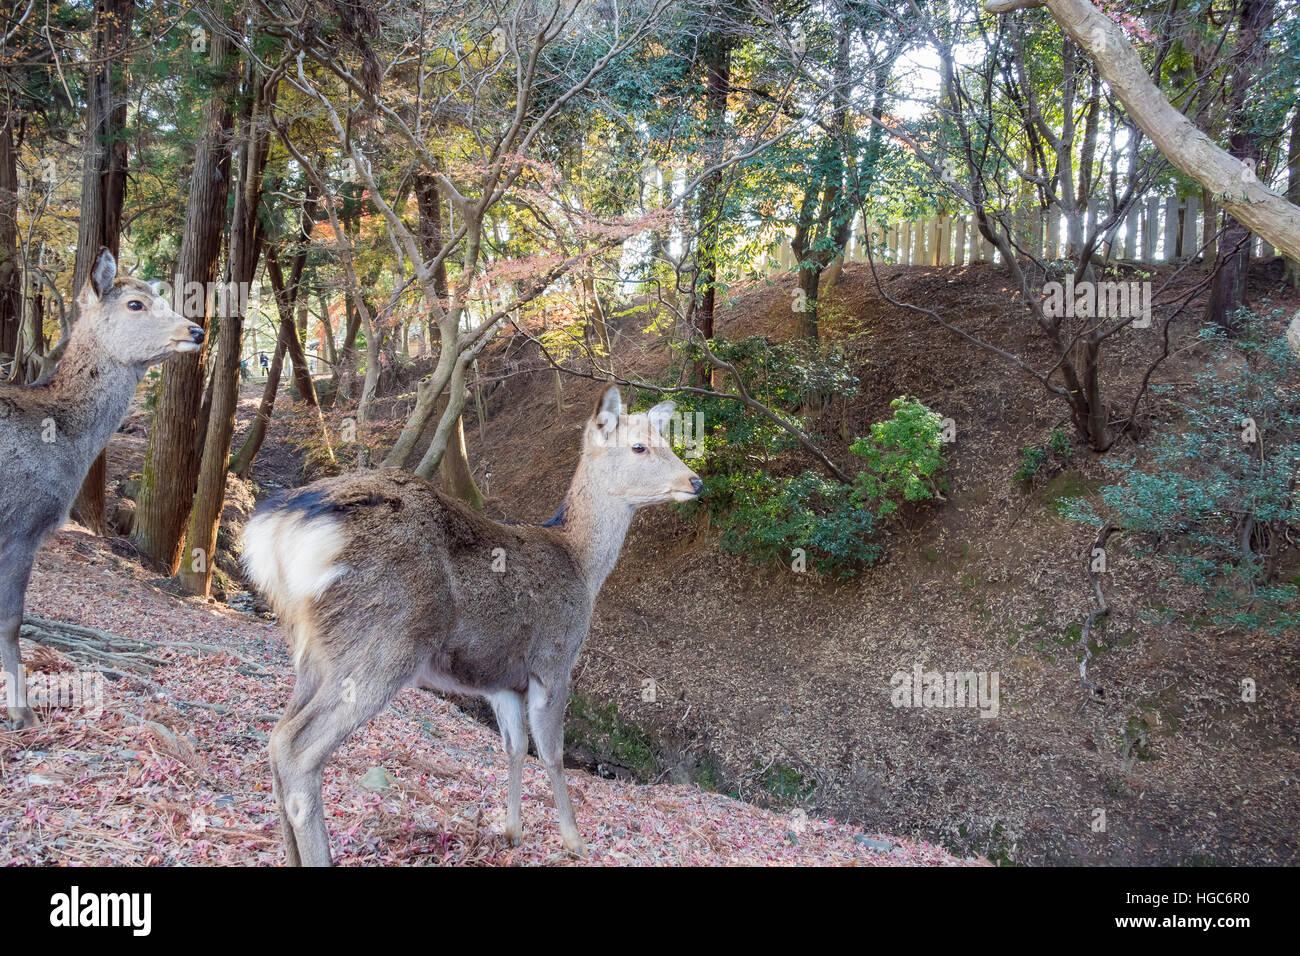 Deer and the famous and historical TodaiJi in Nara Park Nara, Japan - Stock Image